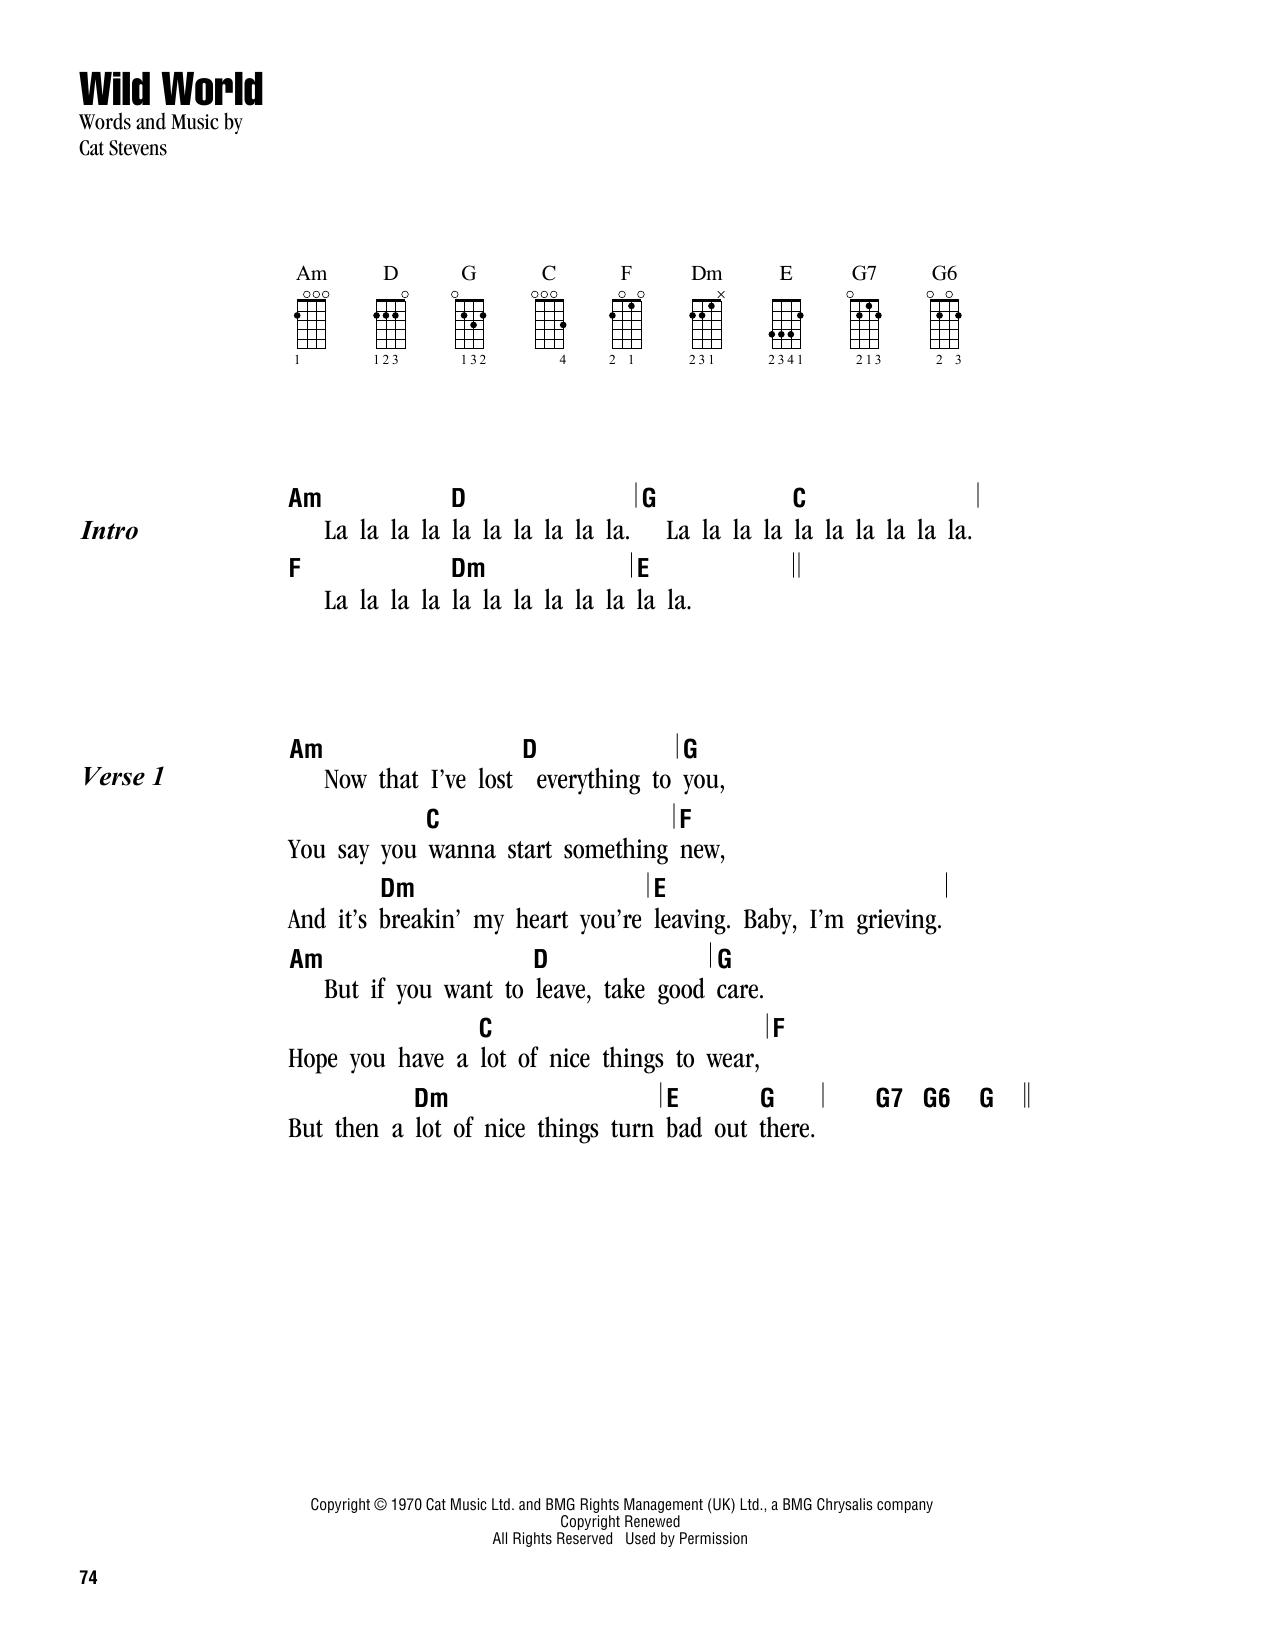 Tablature guitare Wild World de Cat Stevens - Ukulele (strumming patterns)